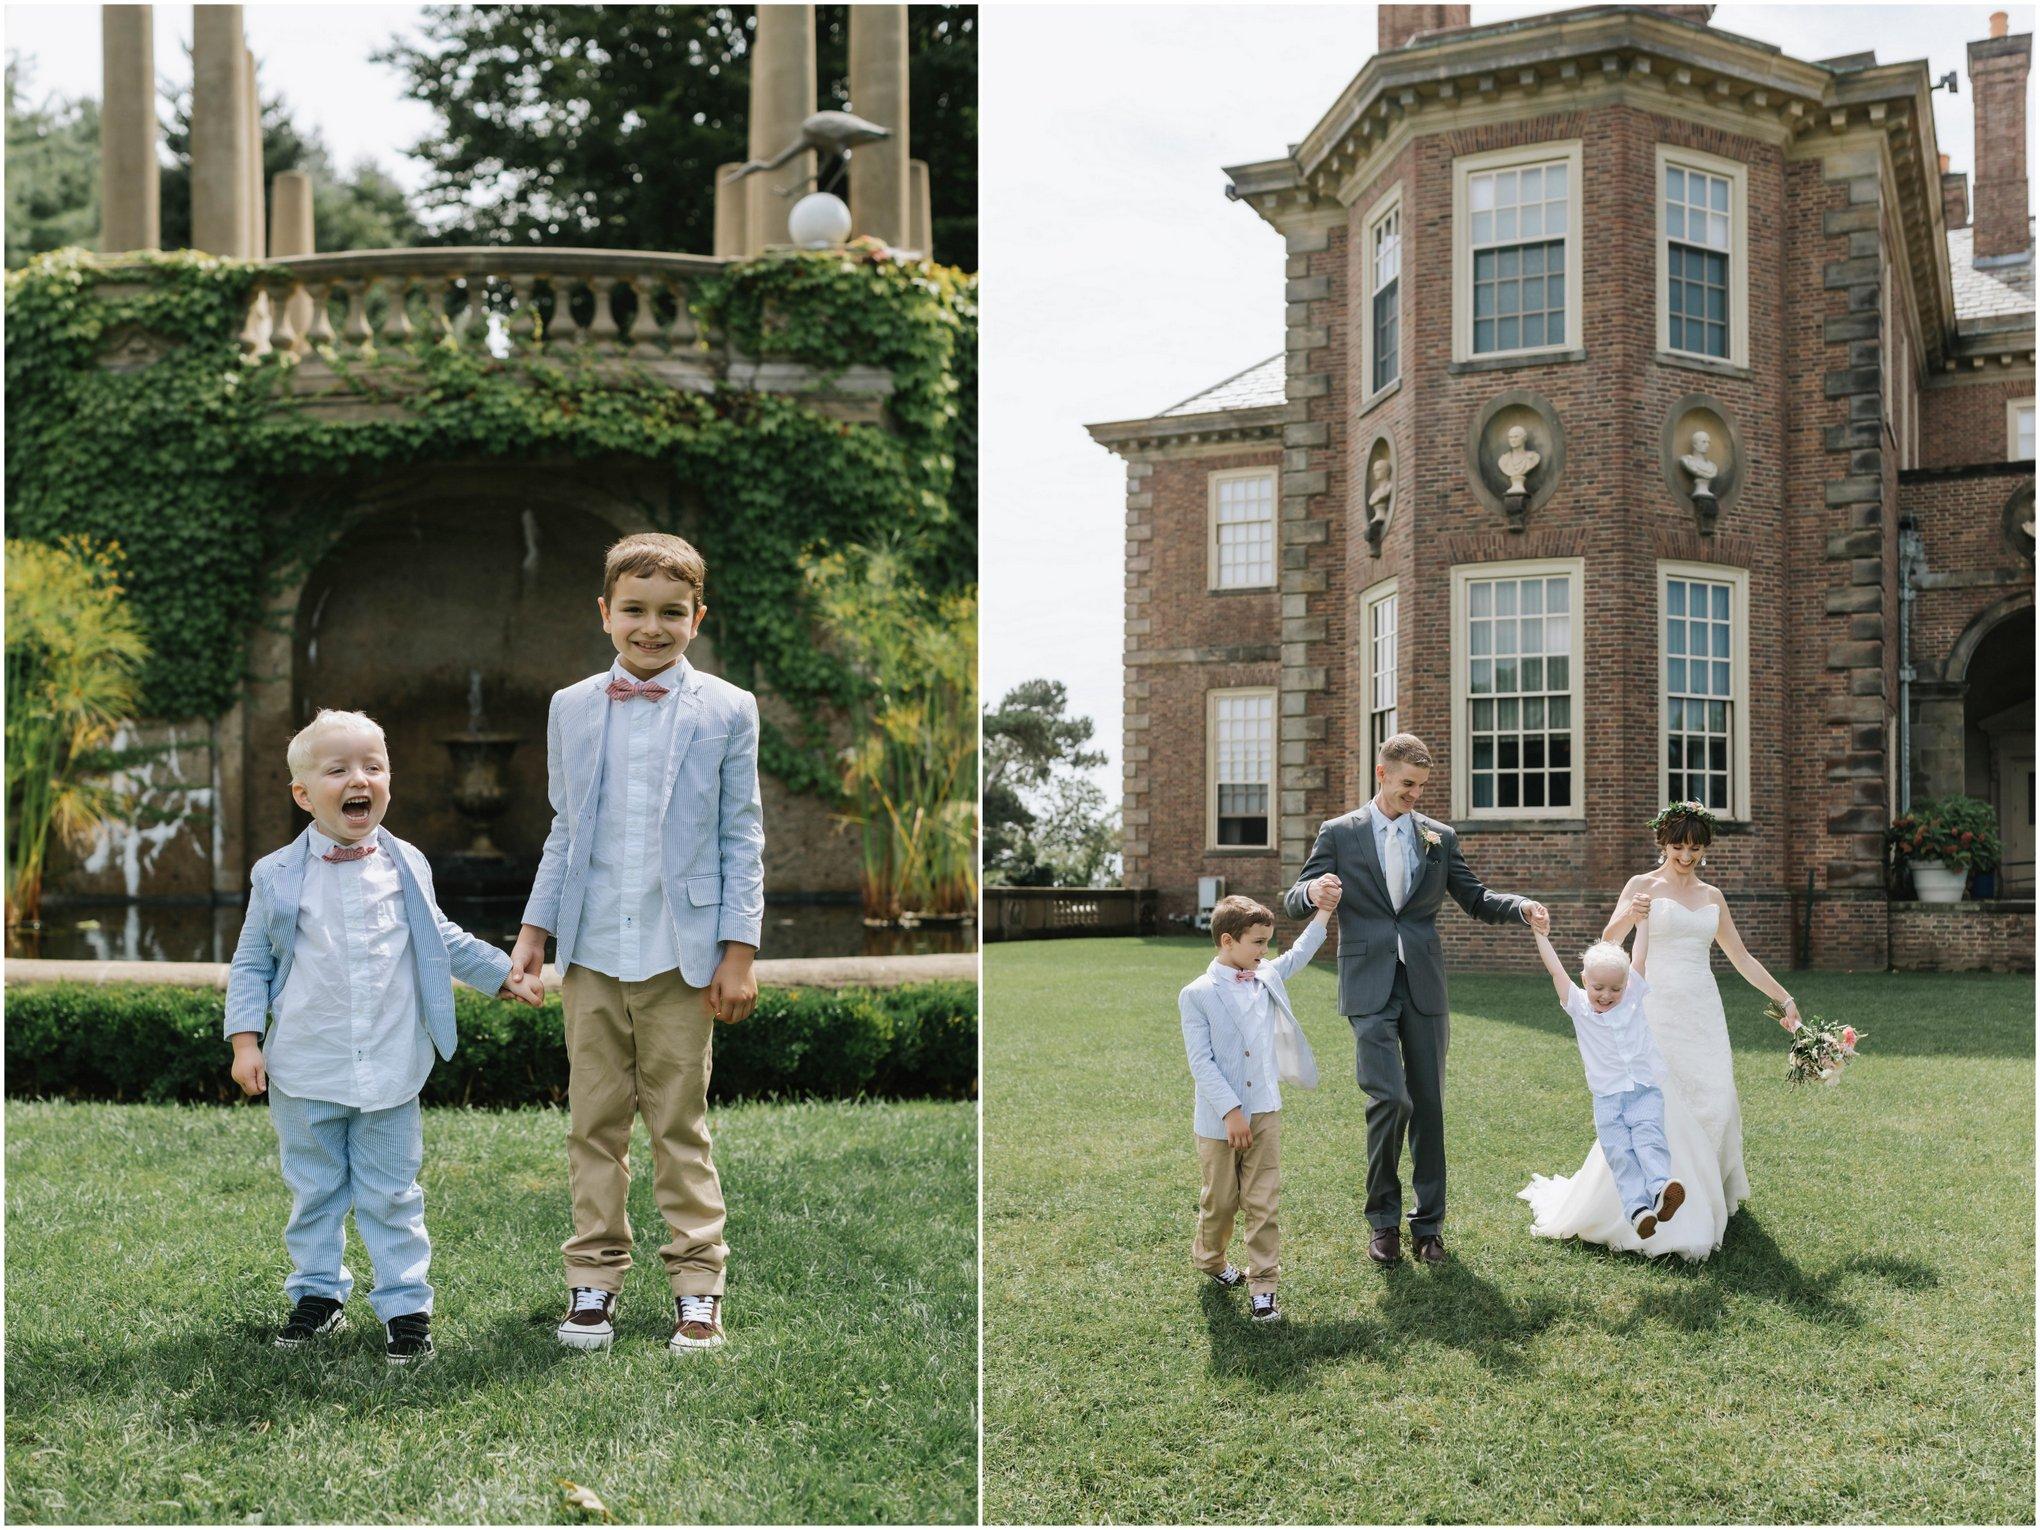 Crane-Estate-Vow-Renewal-Wedding-14.JPG